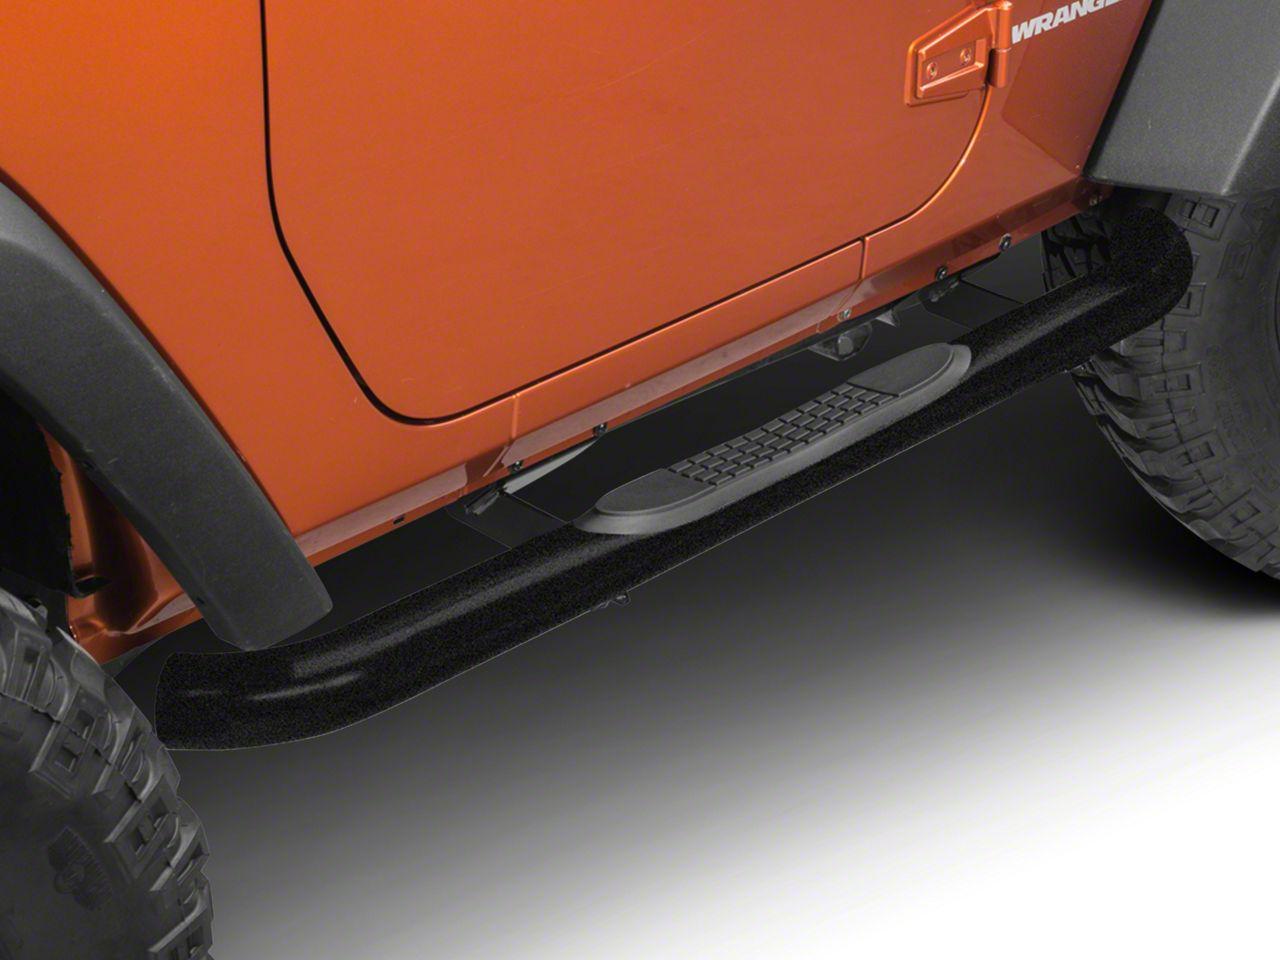 RedRock 4x4 3 in. Round Curved Side Step Bars - Textured Black (07-18 Jeep Wrangler JK 2 Door)